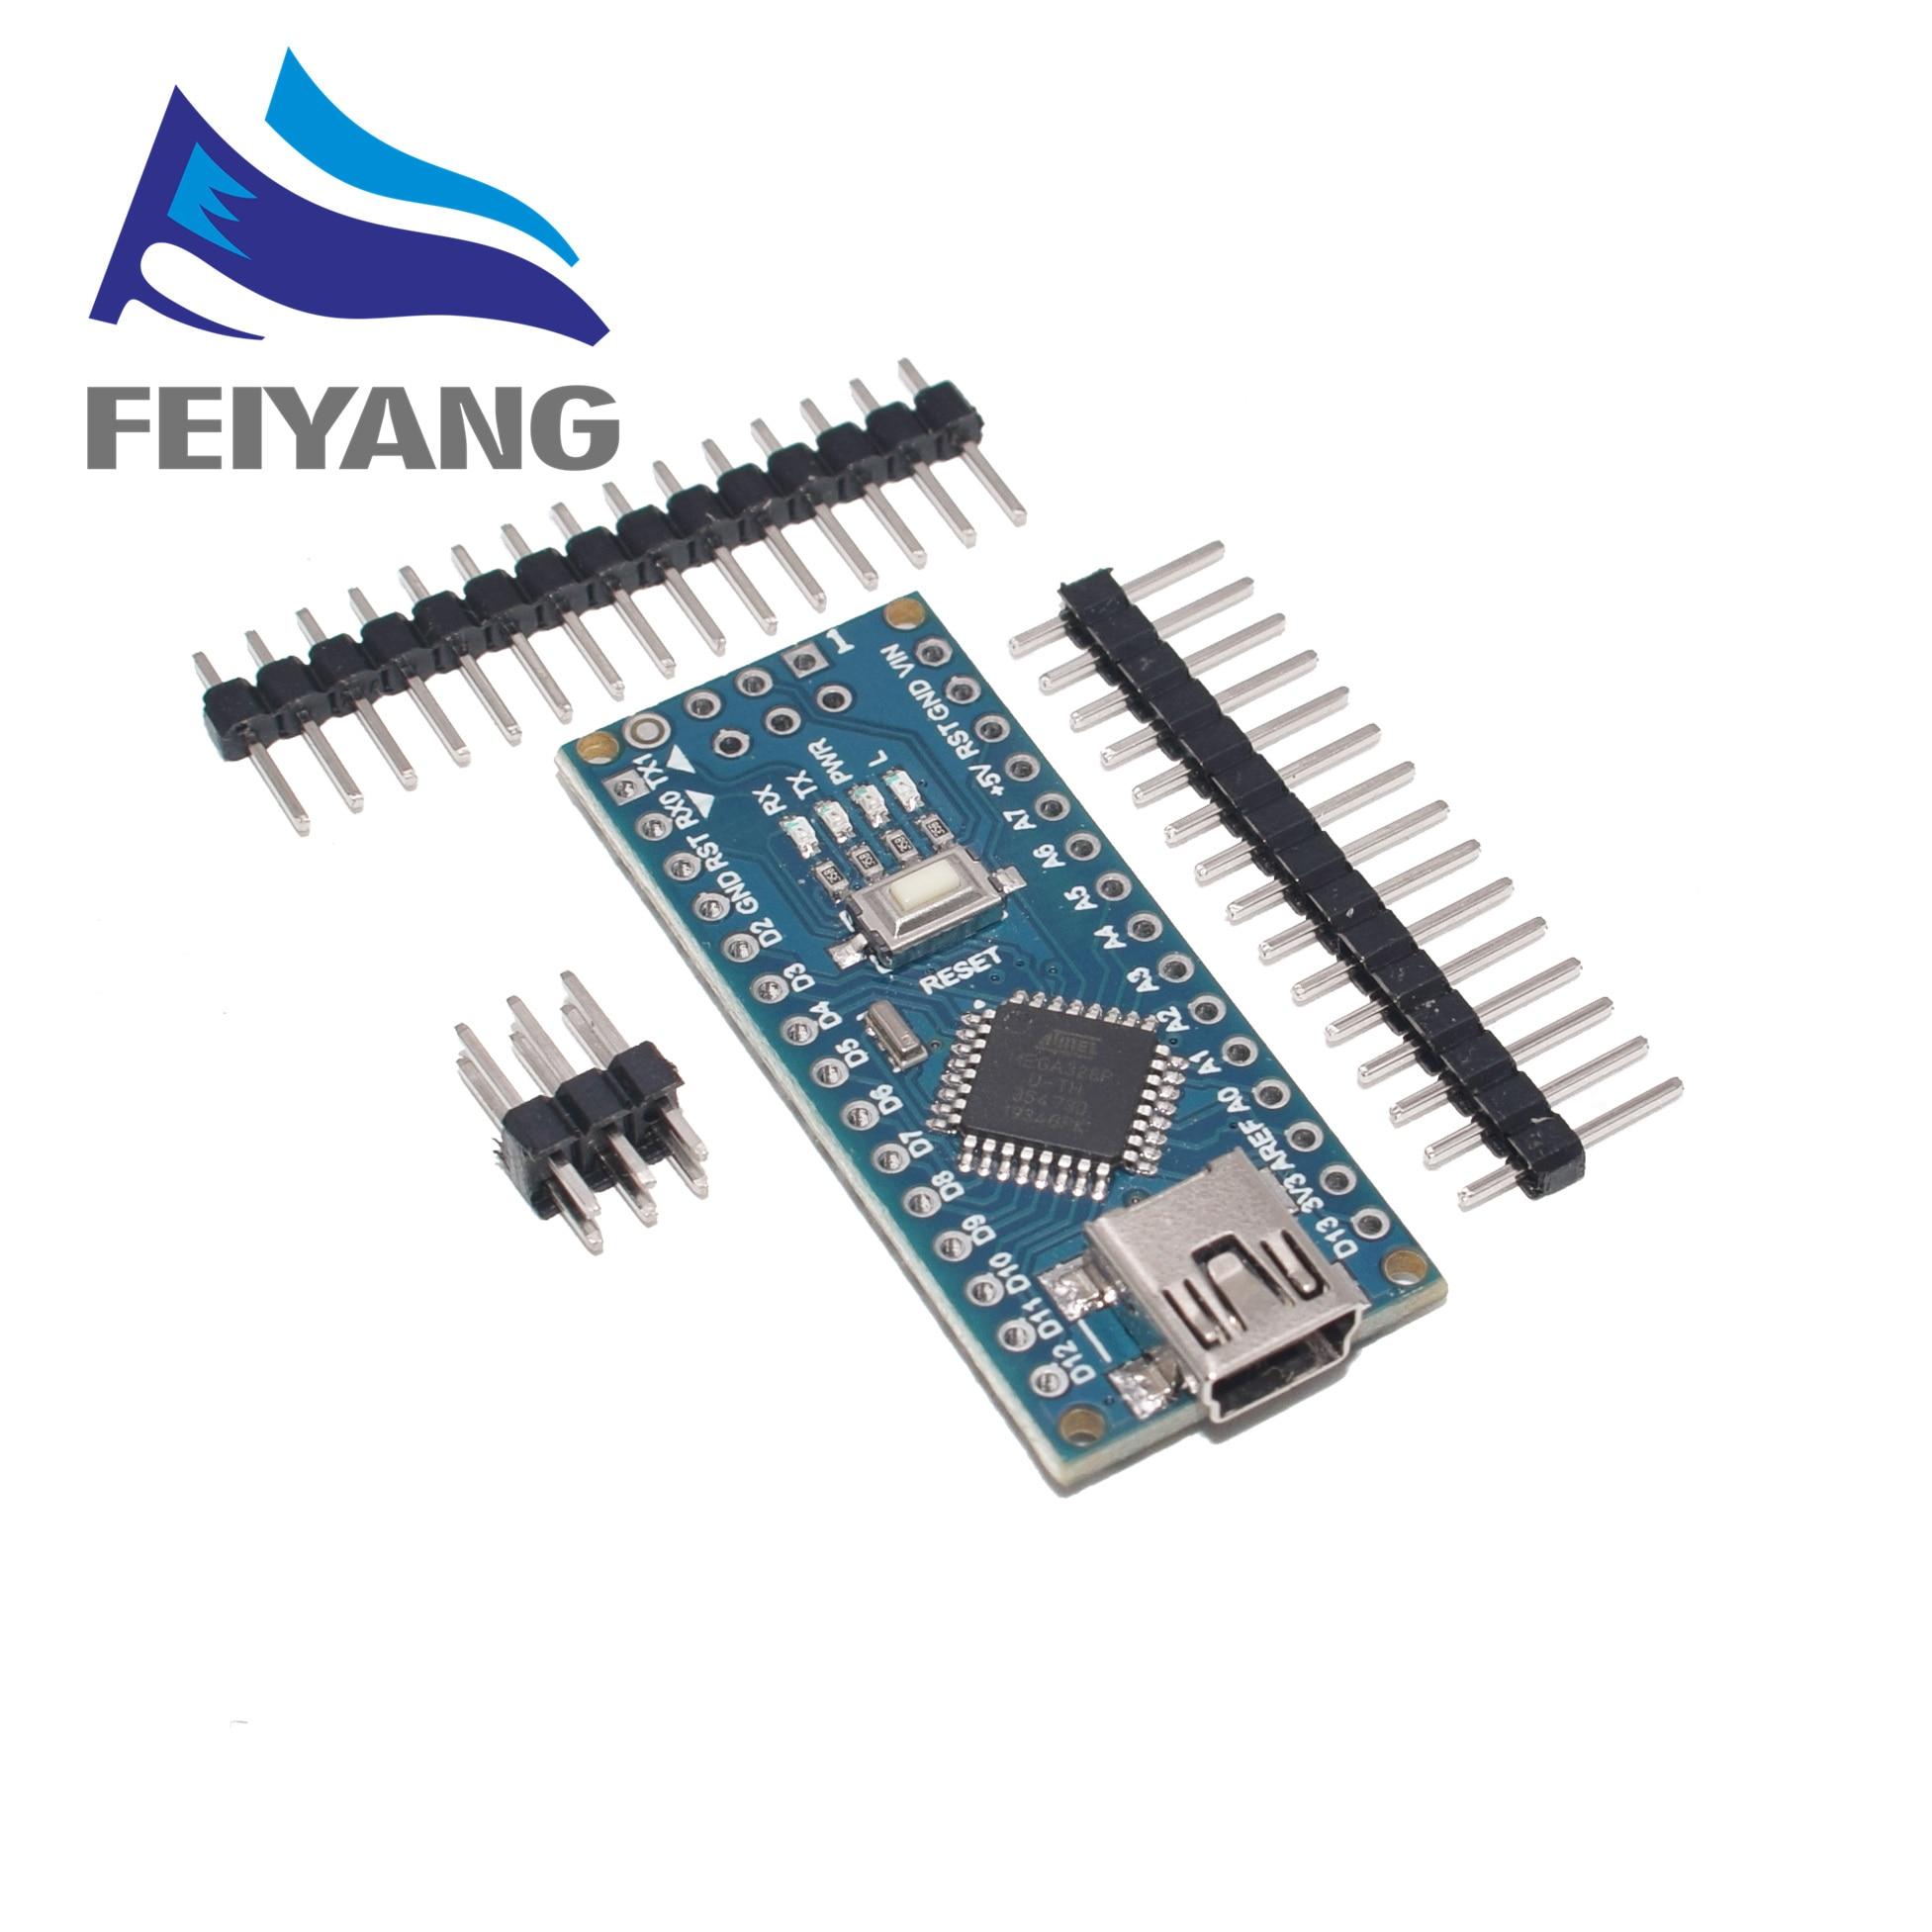 Nano z kontrolerem Nano 3.0 kompatybilnym z bootloaderem dla arduino CH340 dysk usb 16Mhz Nano v3.0 ATMEGA328P/168 P 2